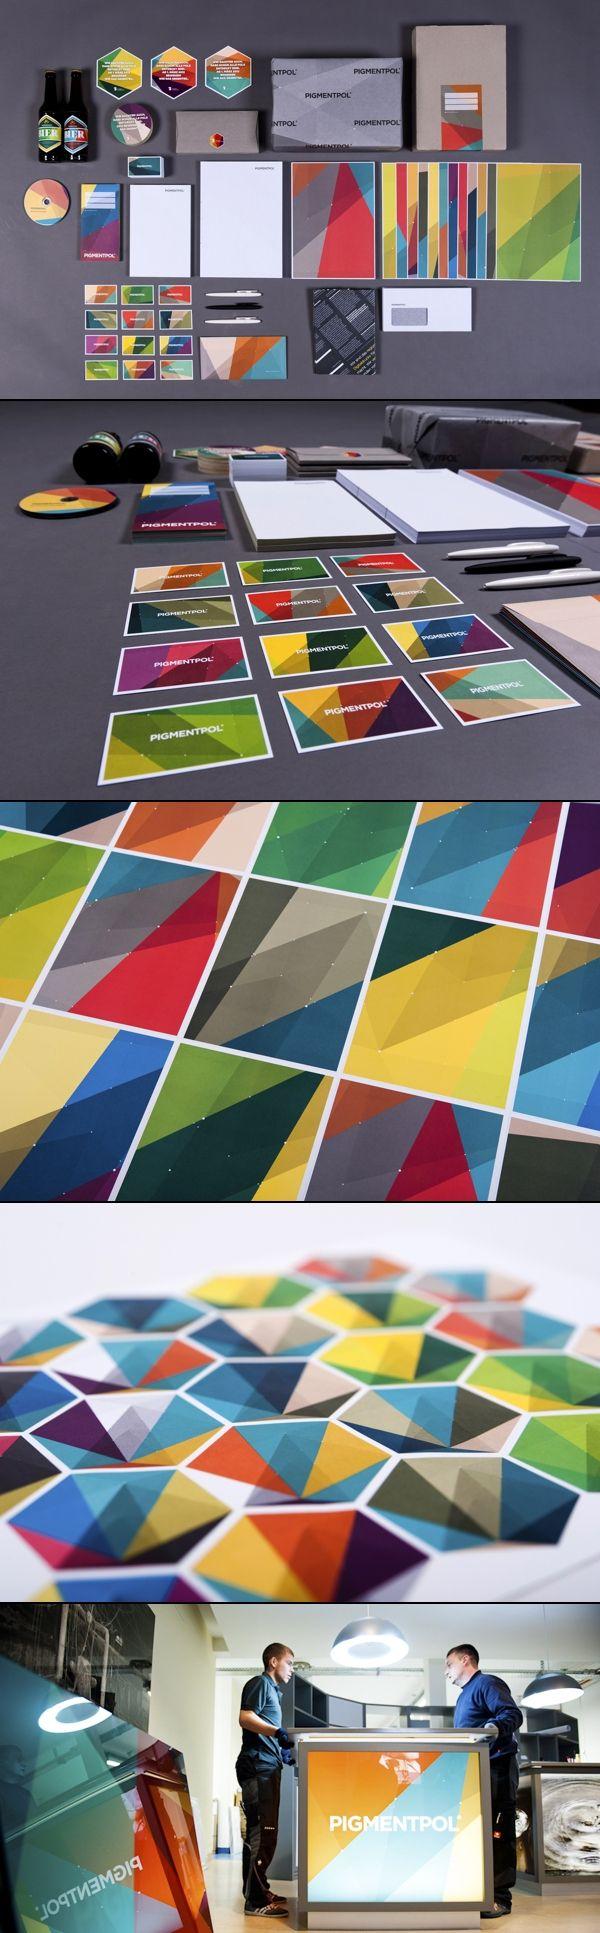 Pigmentpol via Behance #identity #packaging #branding PD